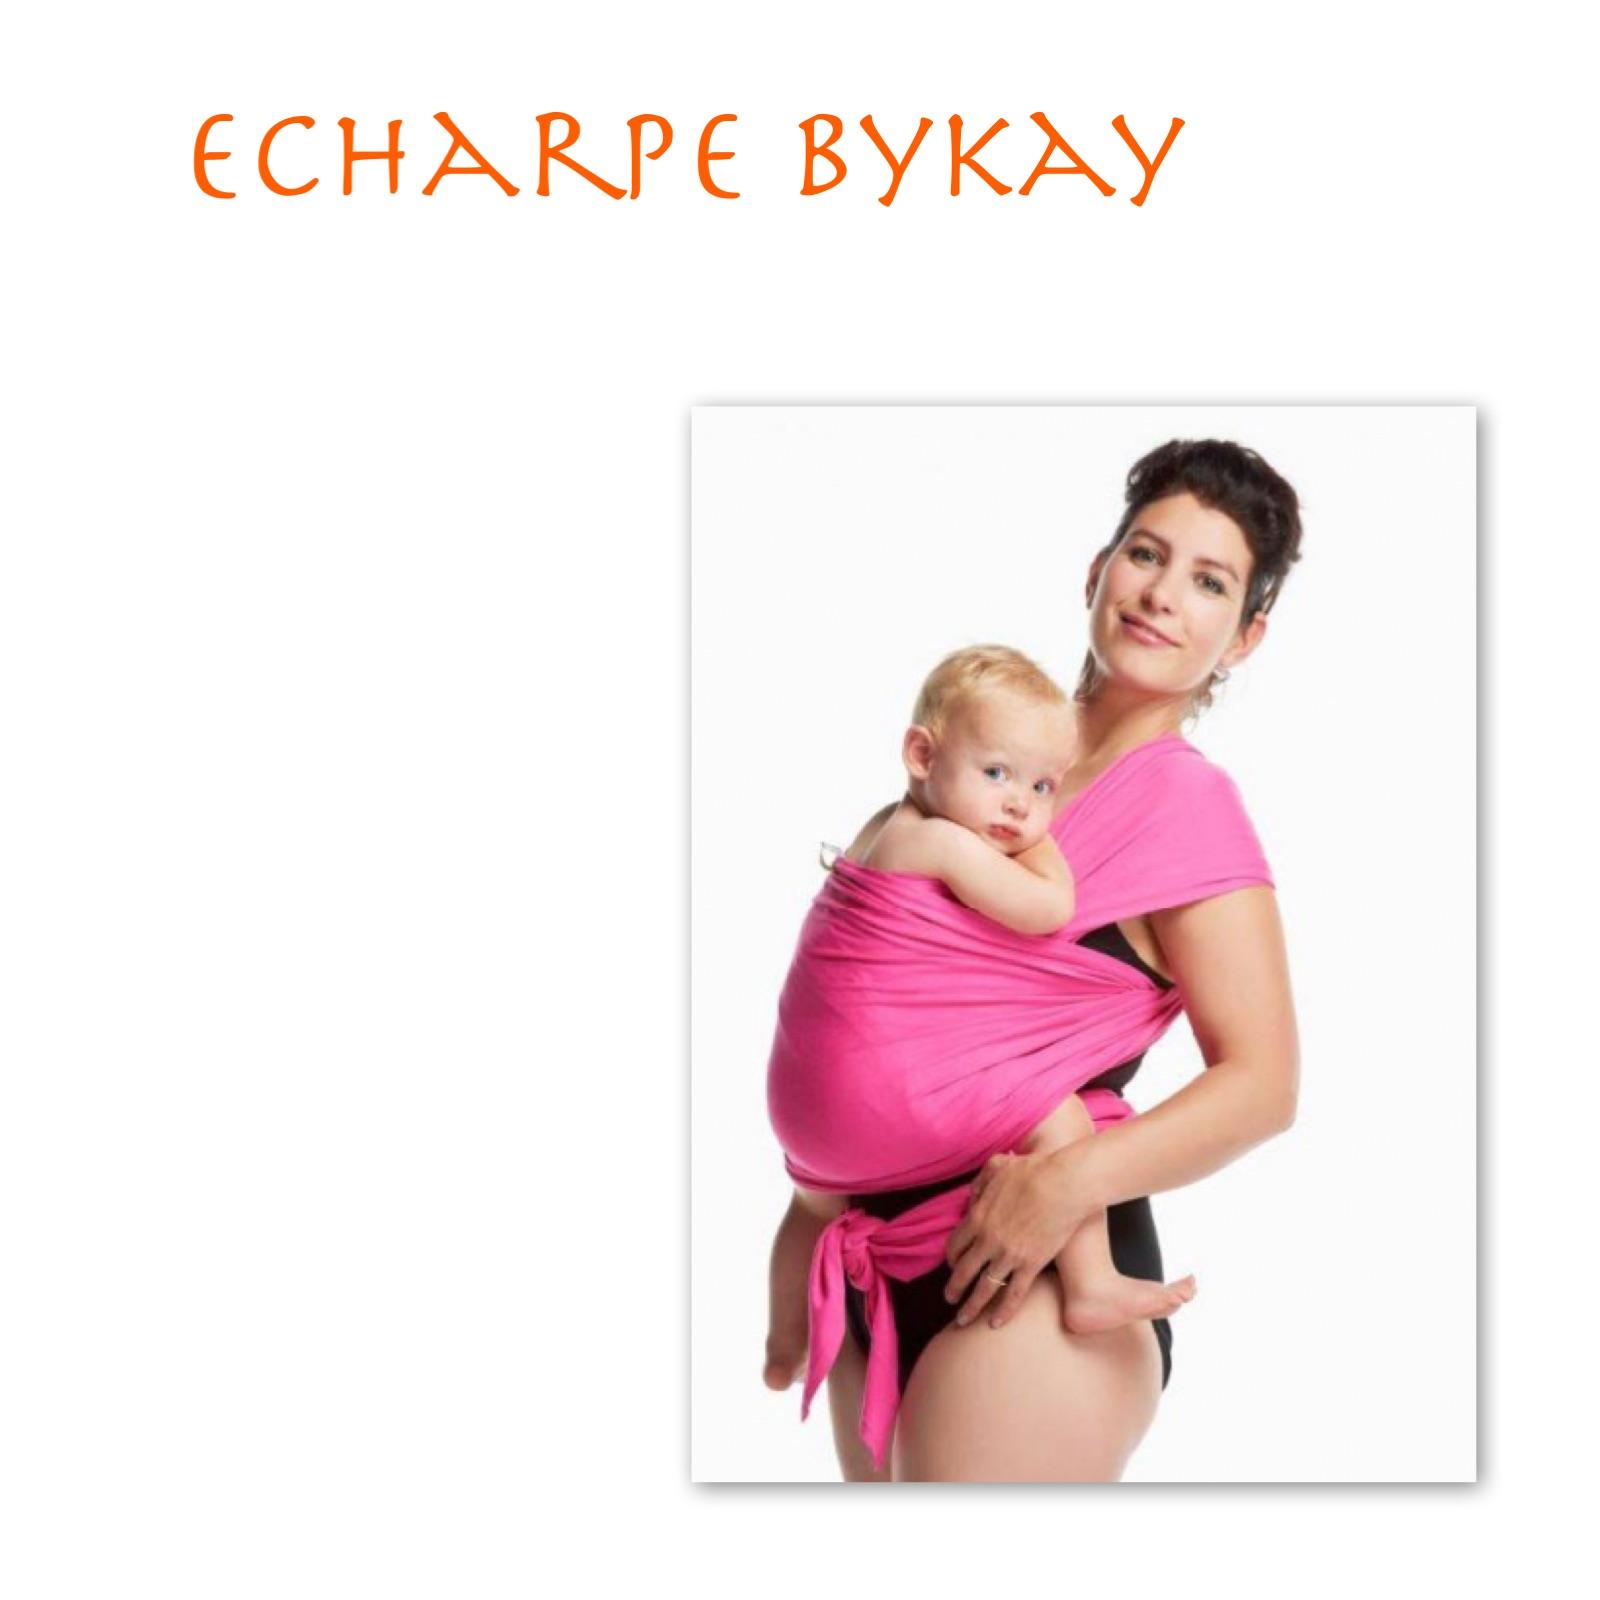 Echarpe ByKay